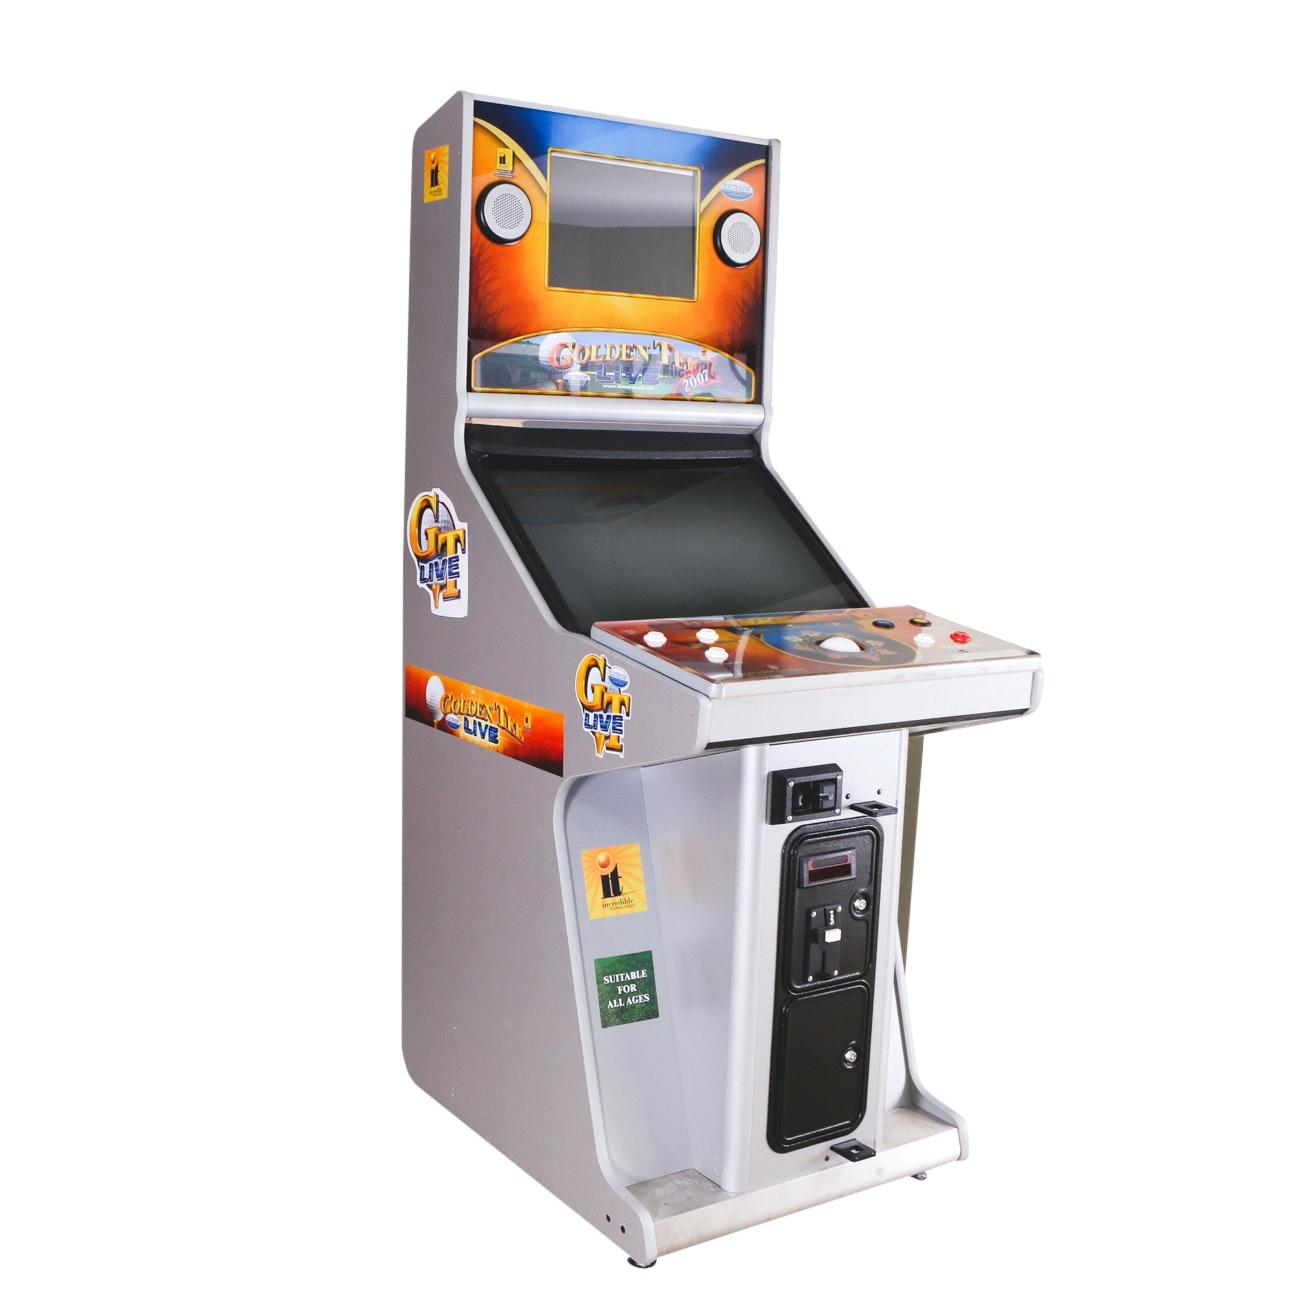 Golden Tee Live 2007 Arcade Game